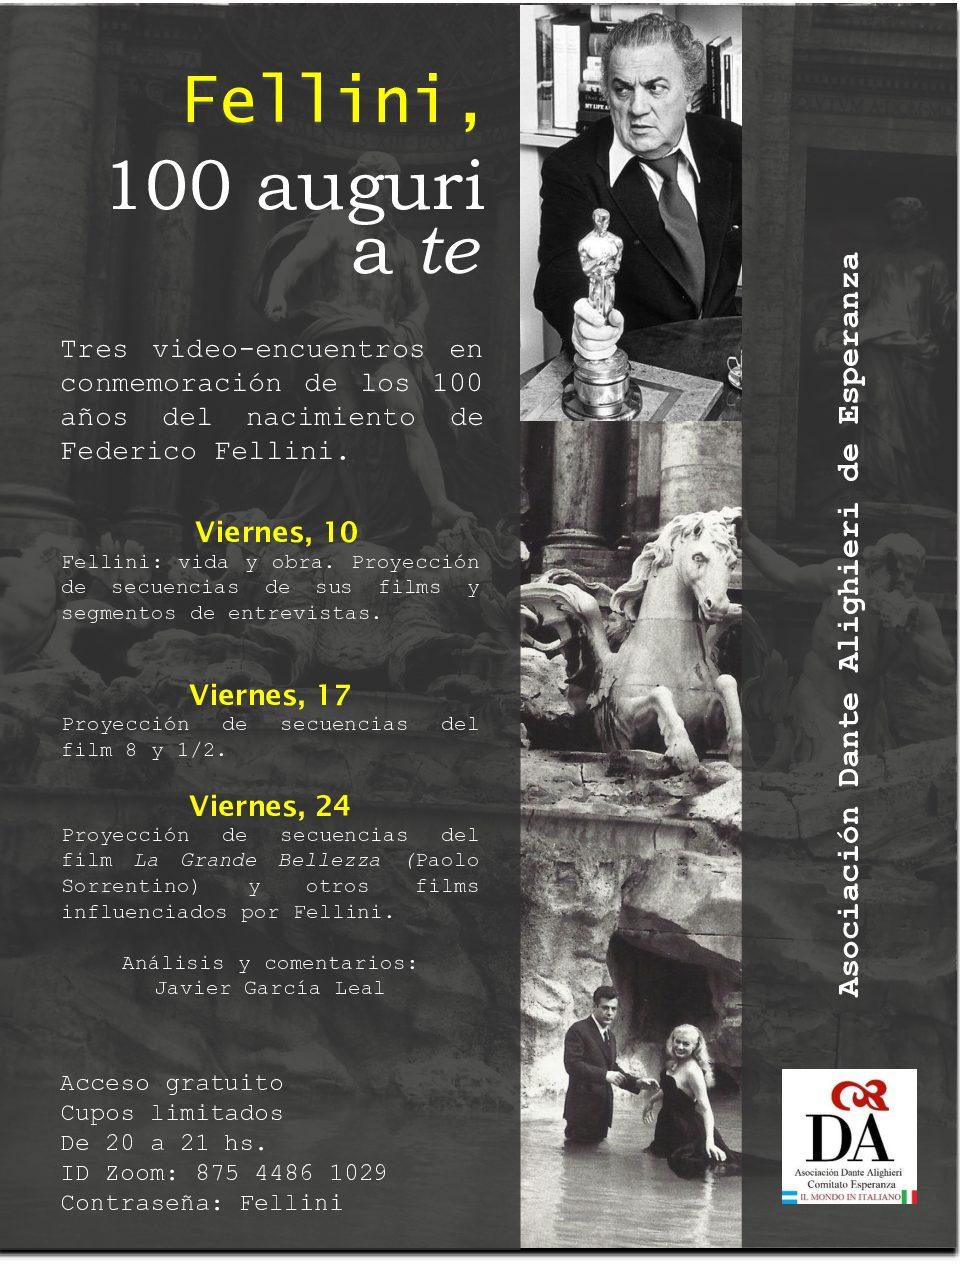 Fellini, 100 auguri a te